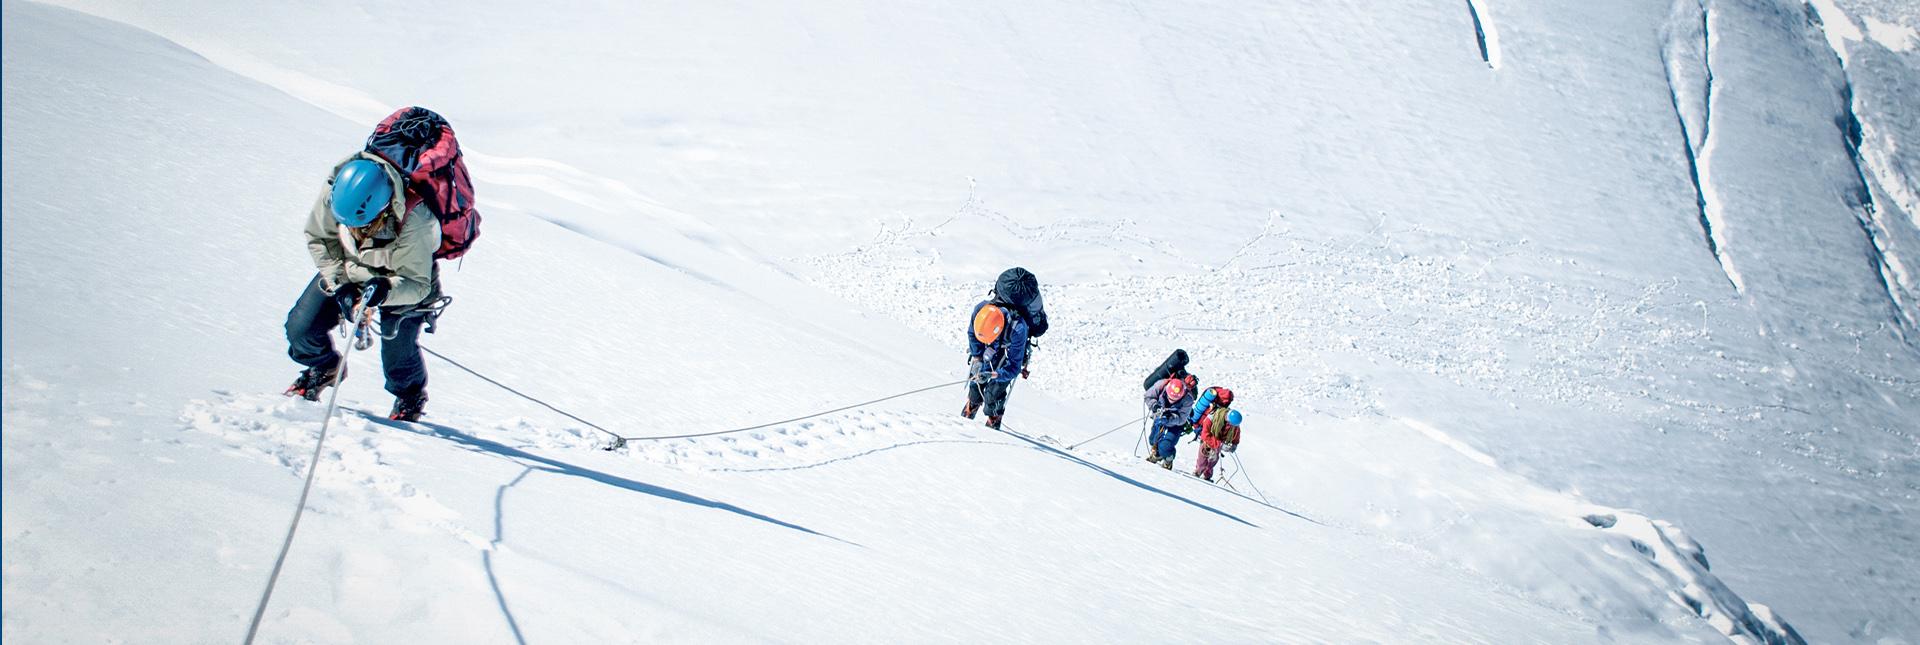 slopes of Monch